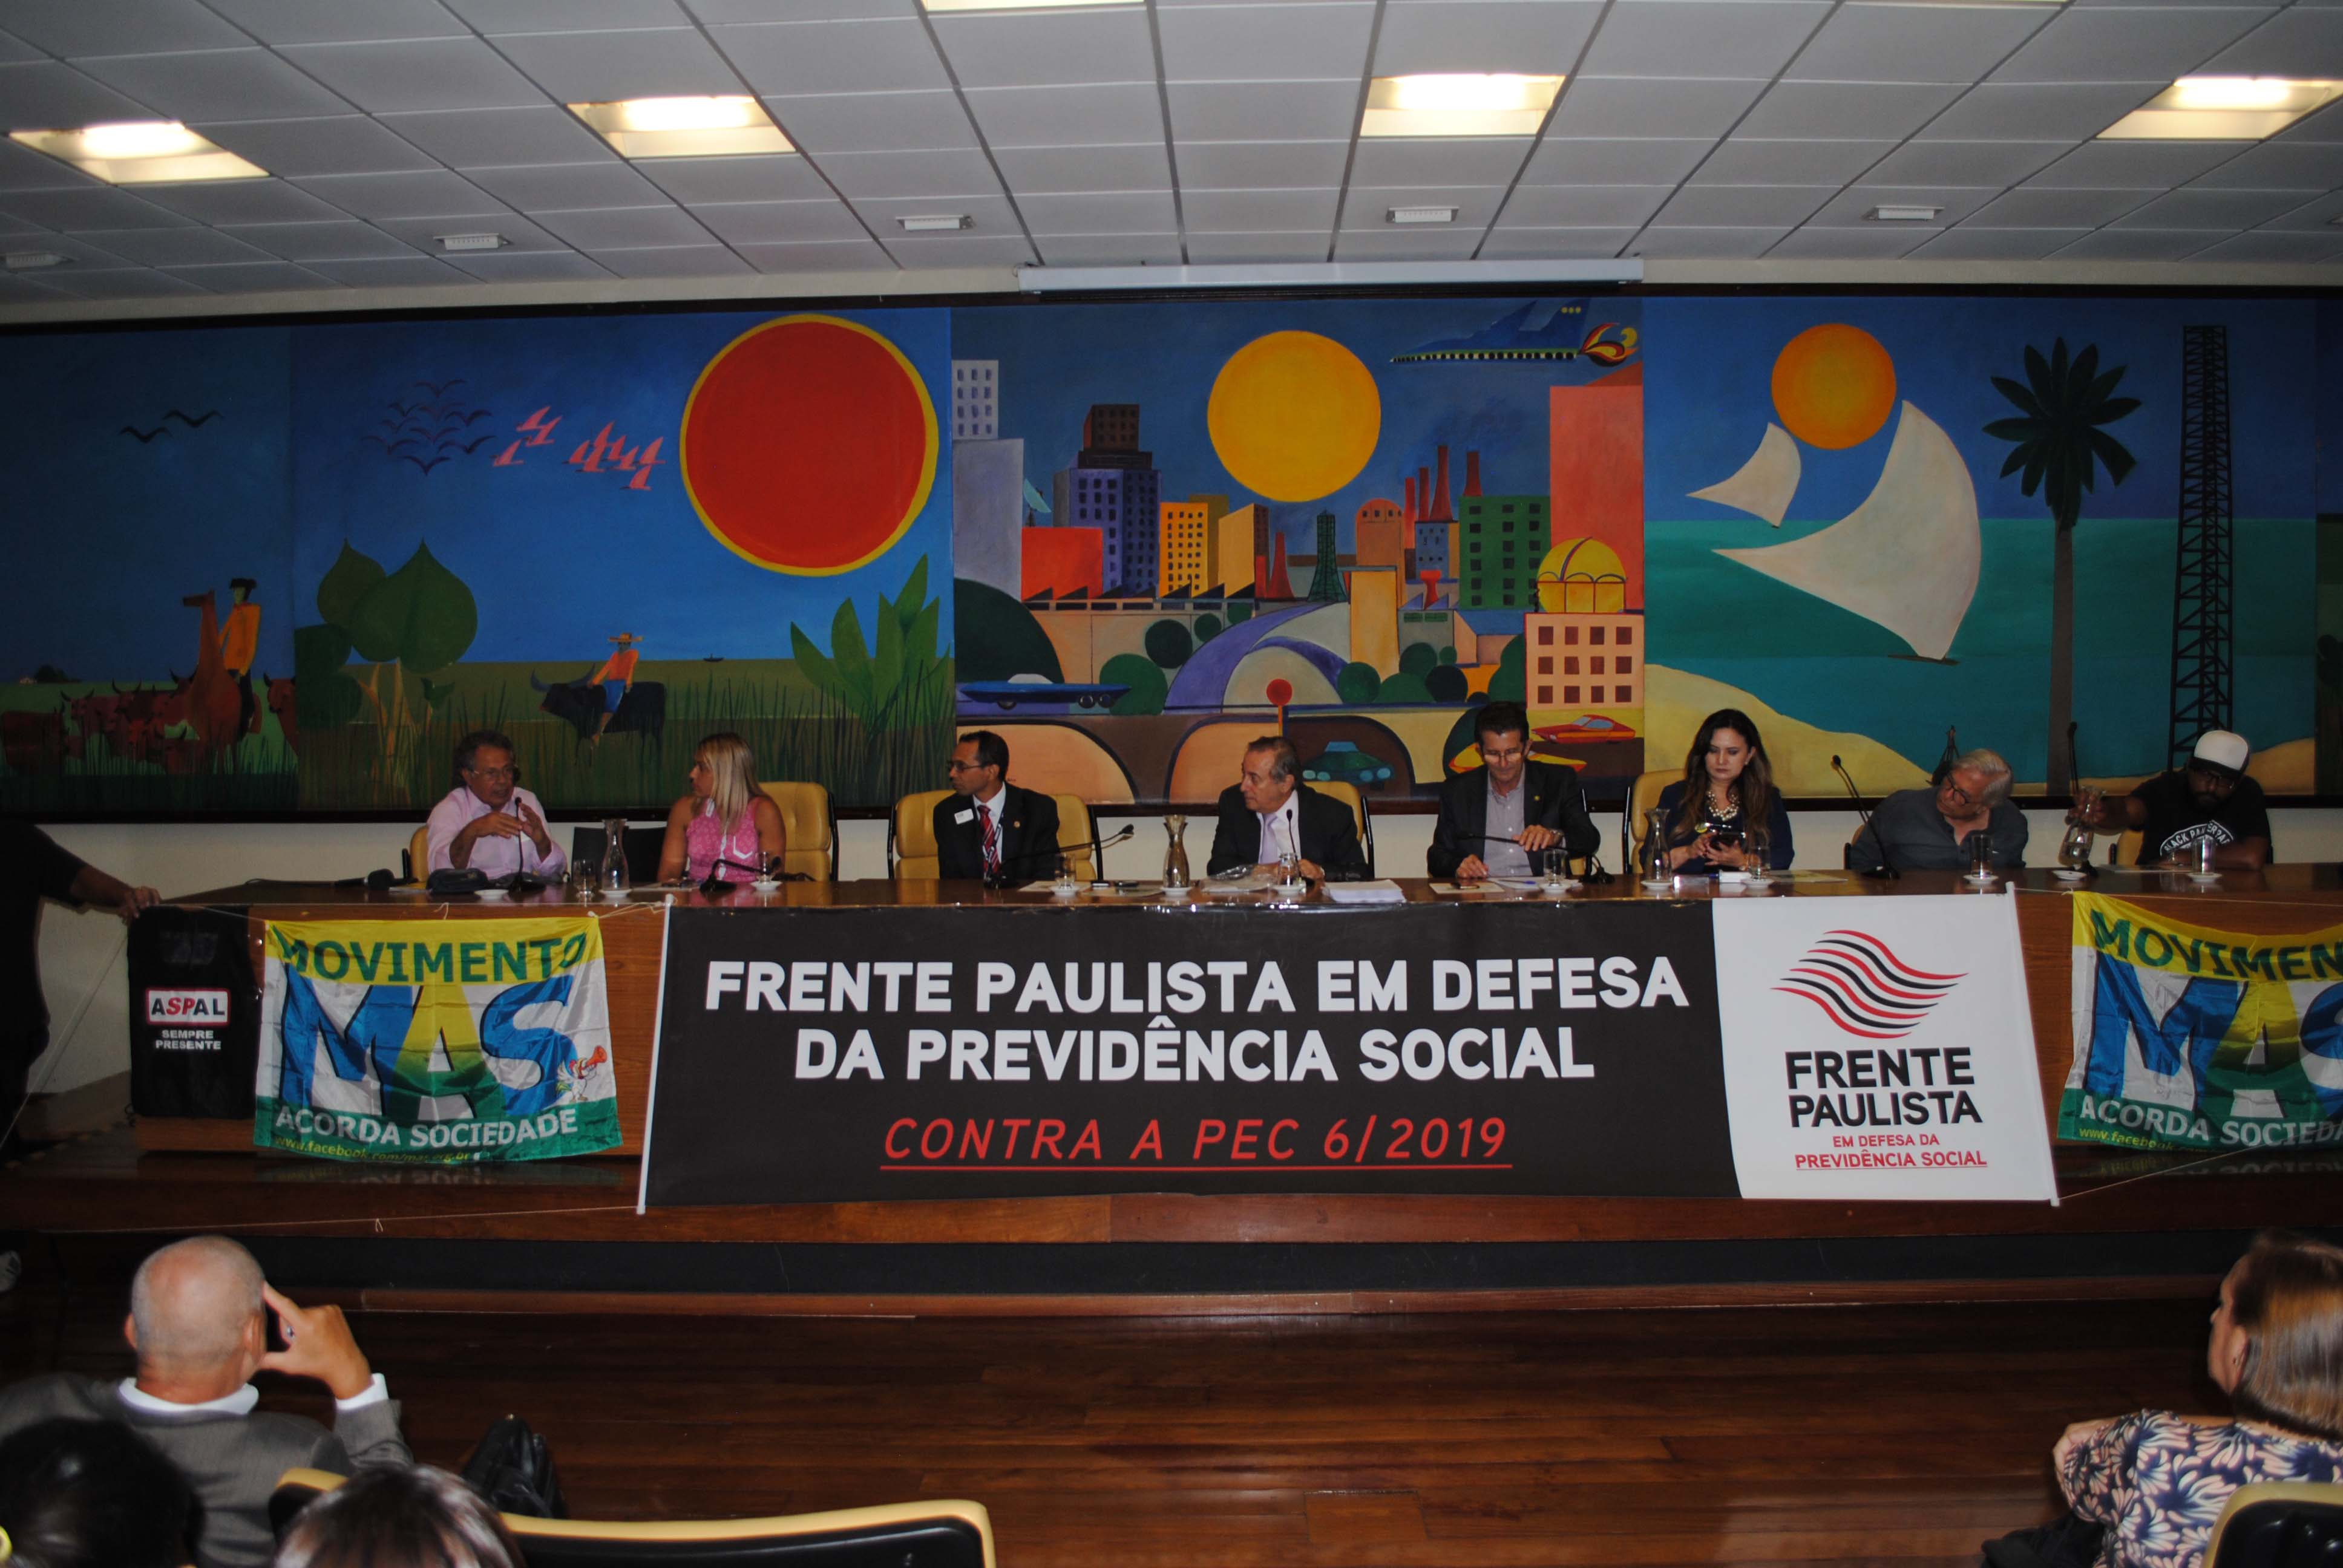 FRENTE PAULISTA CONTRA REFORMA (31)